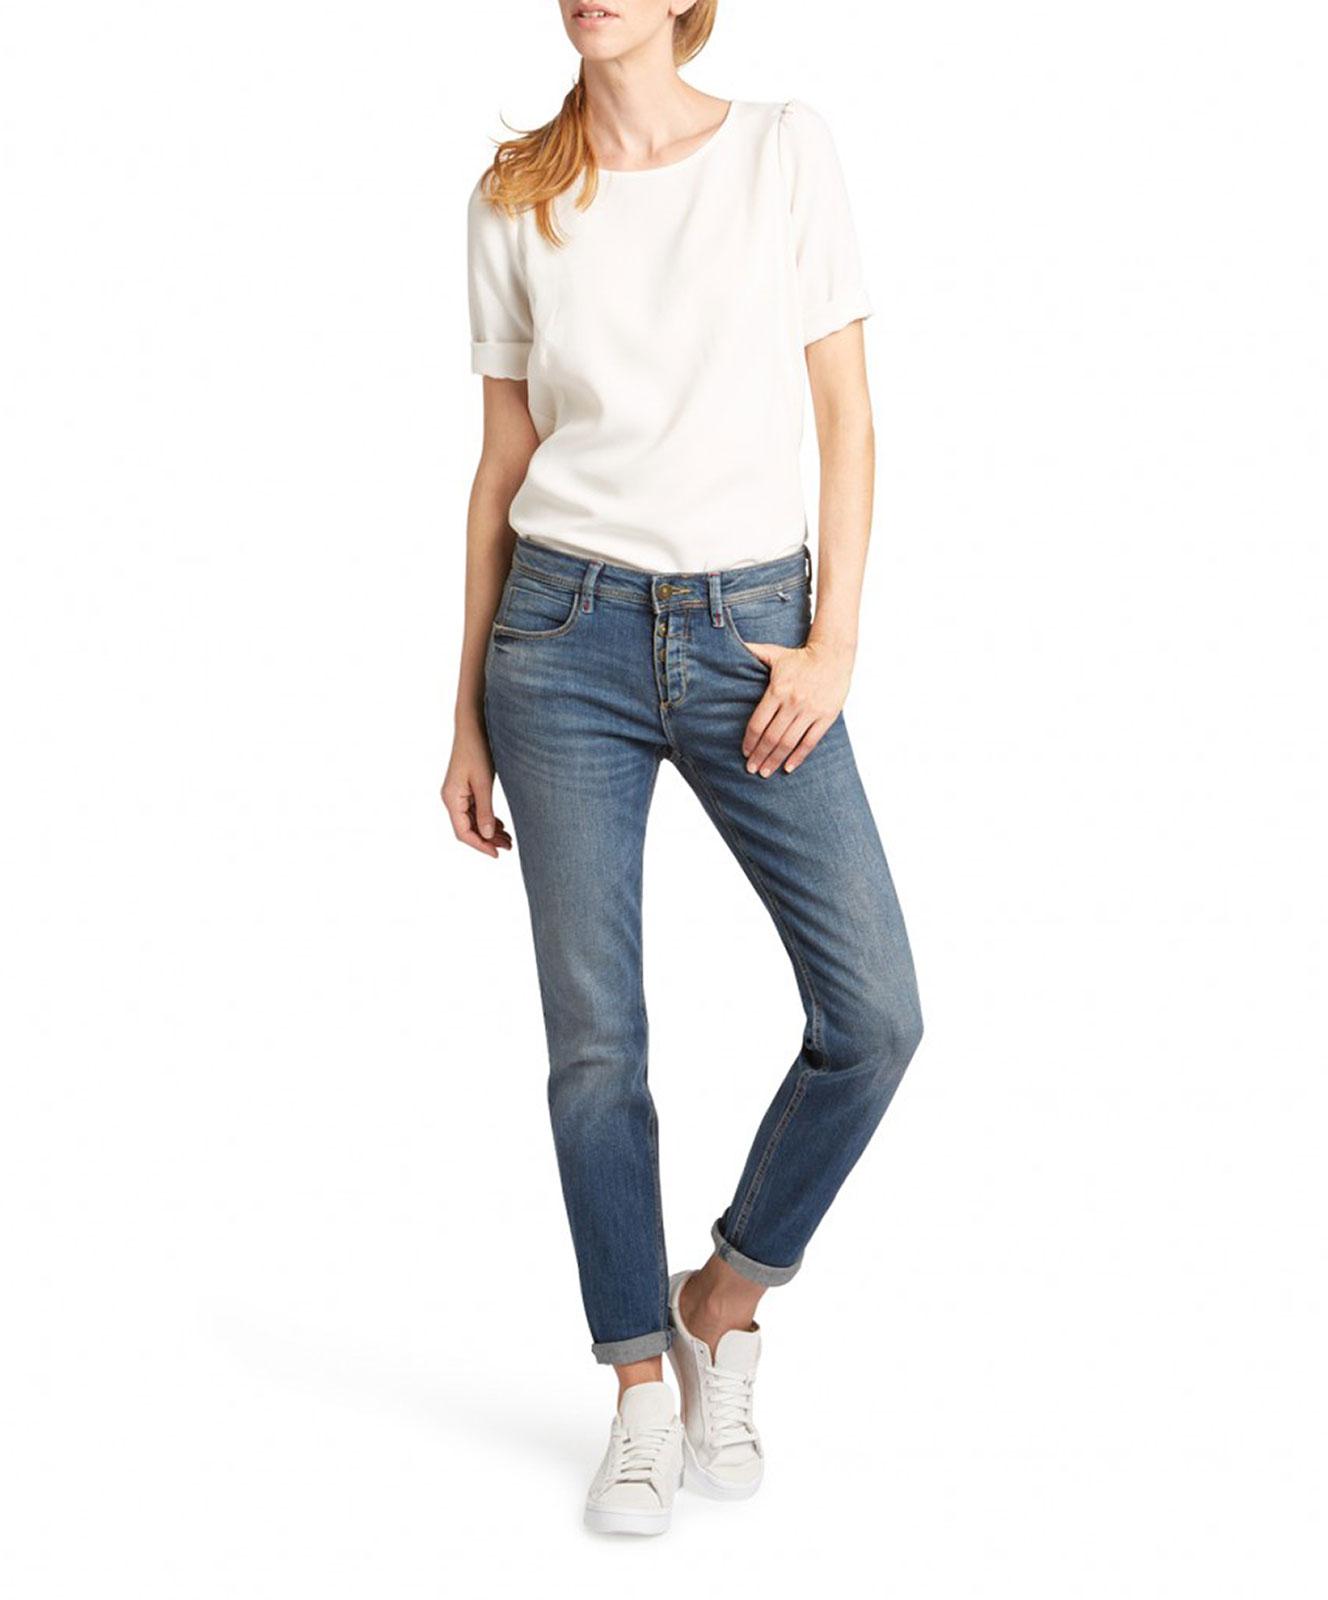 Hosen für Frauen - HIS MONROE Jeans Skinny Fit Vision Blue  - Onlineshop Jeans Meile